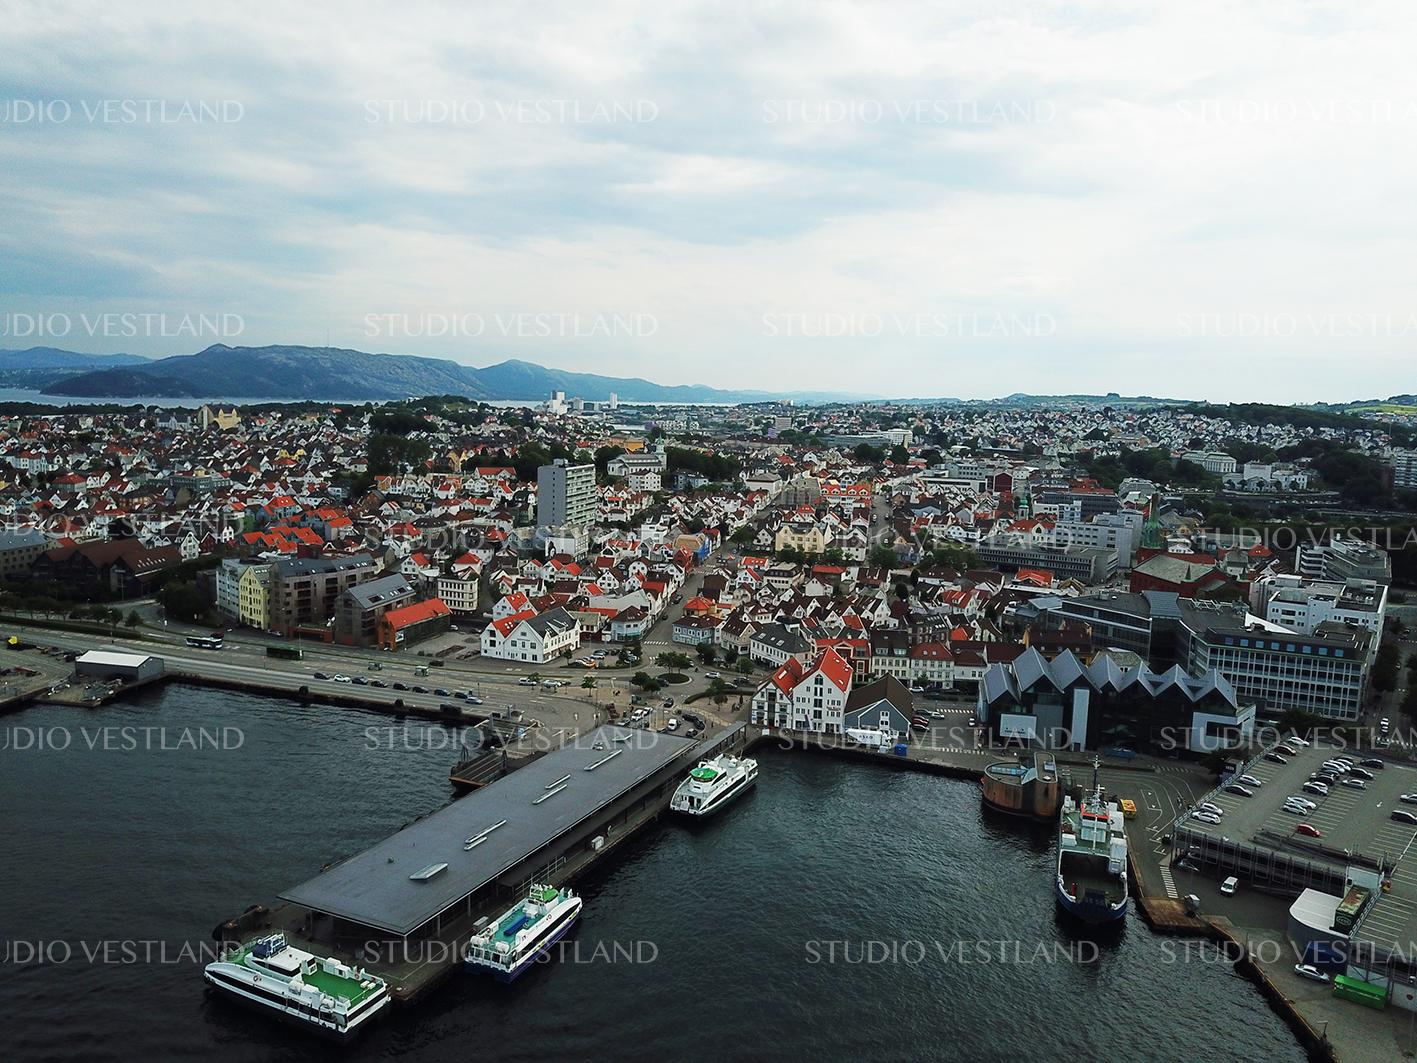 Studio Vestland - Stavanger 23